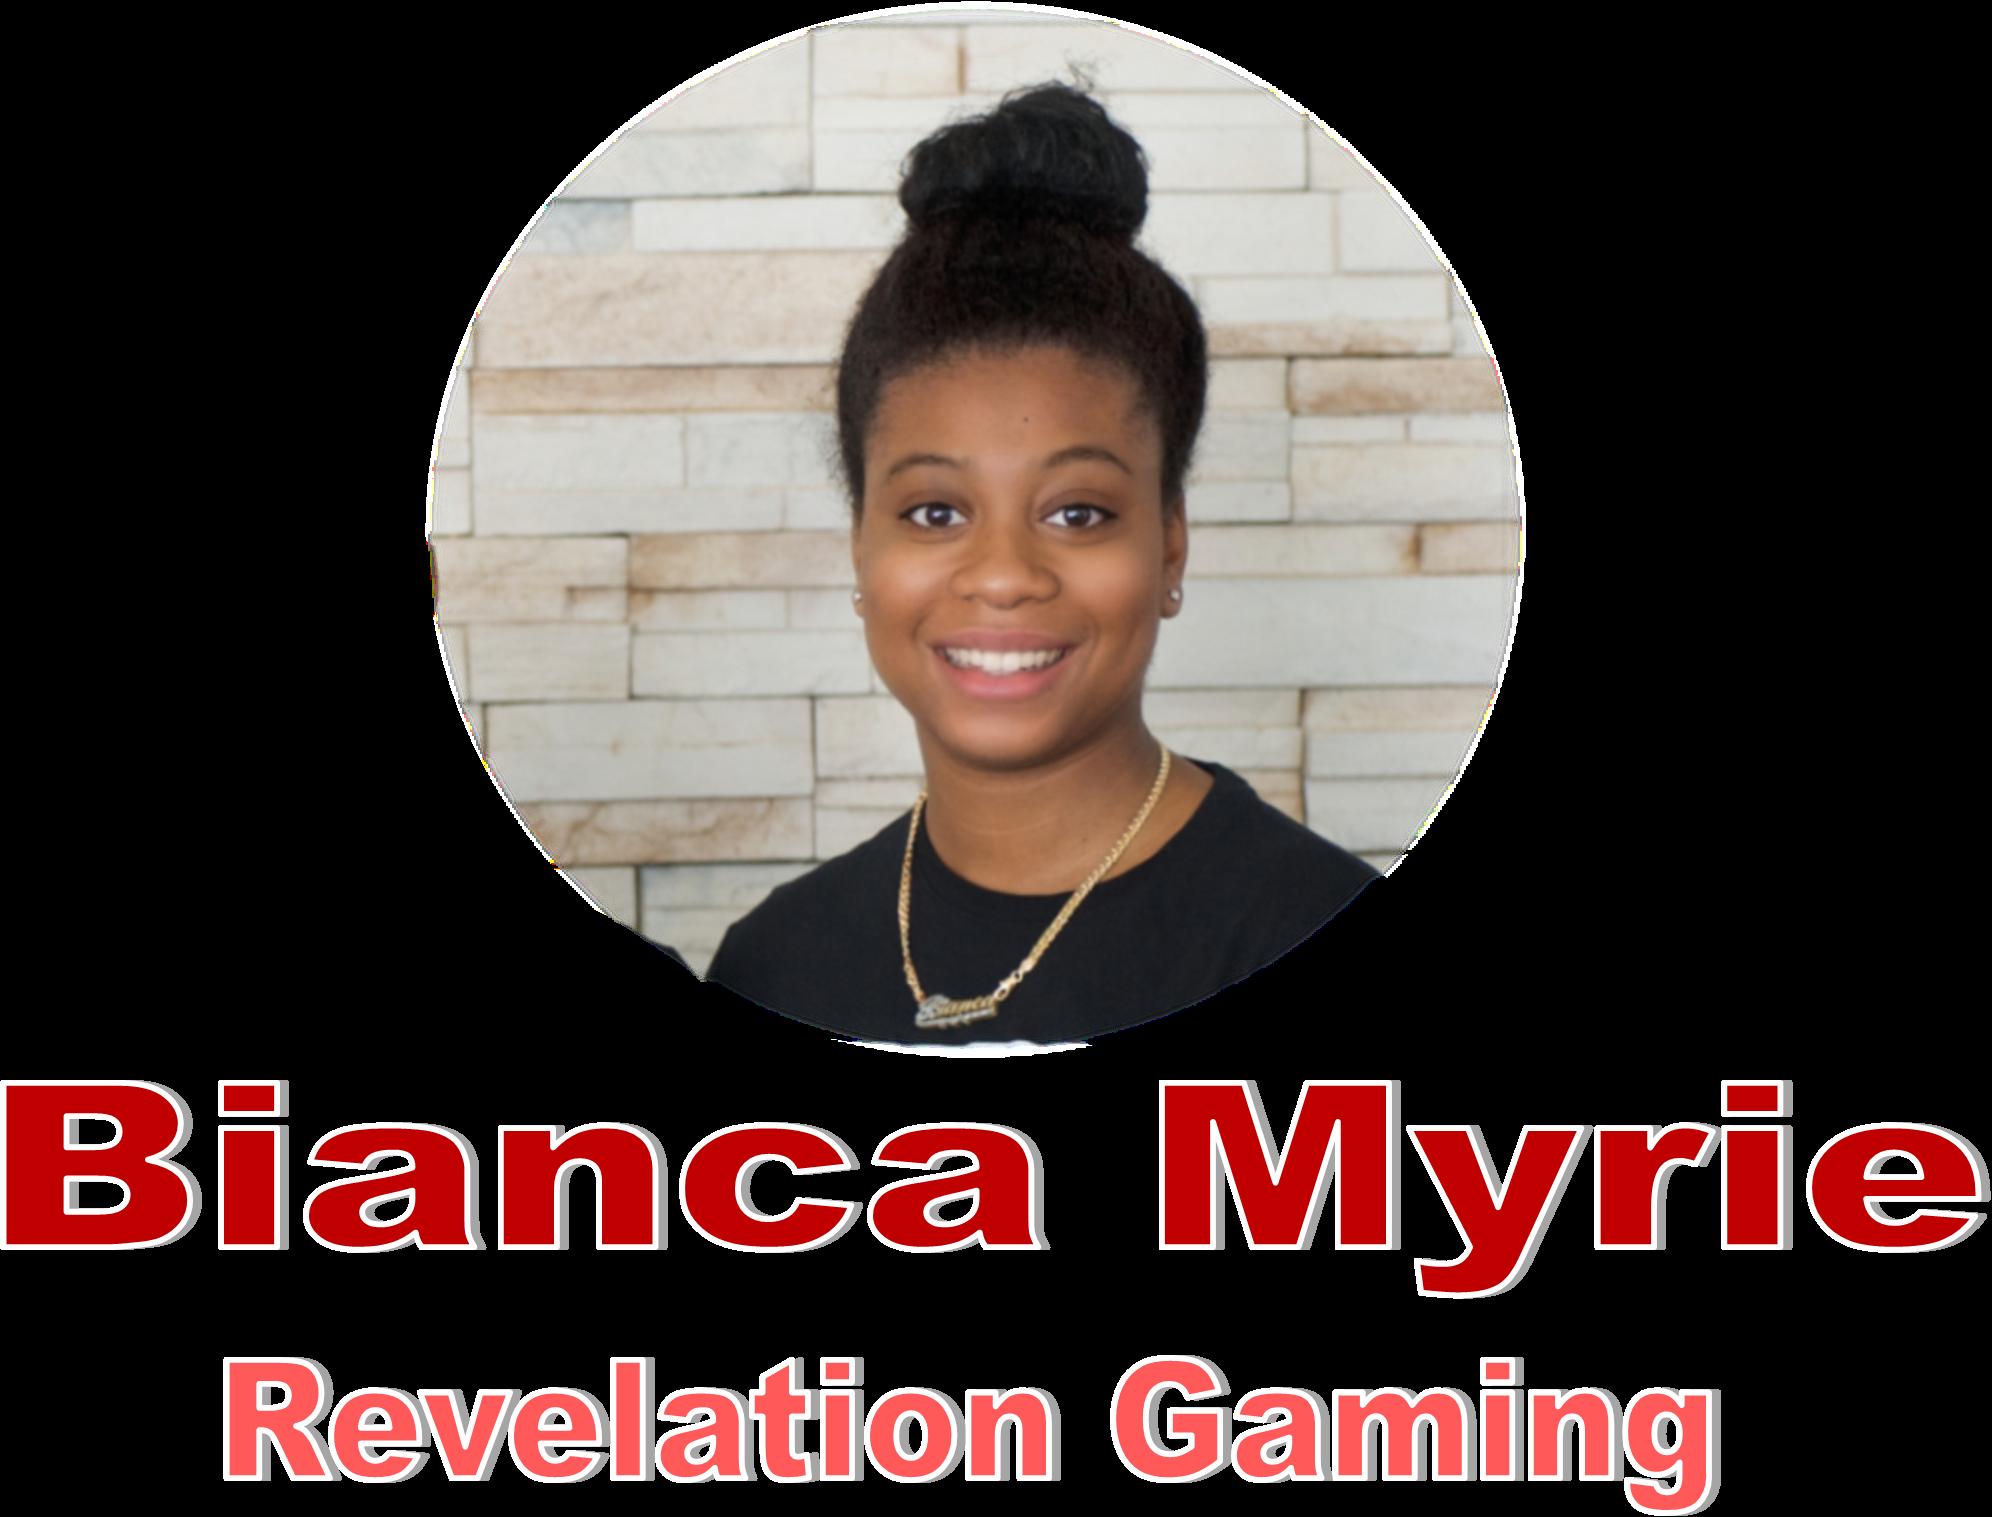 Bianca Myrie